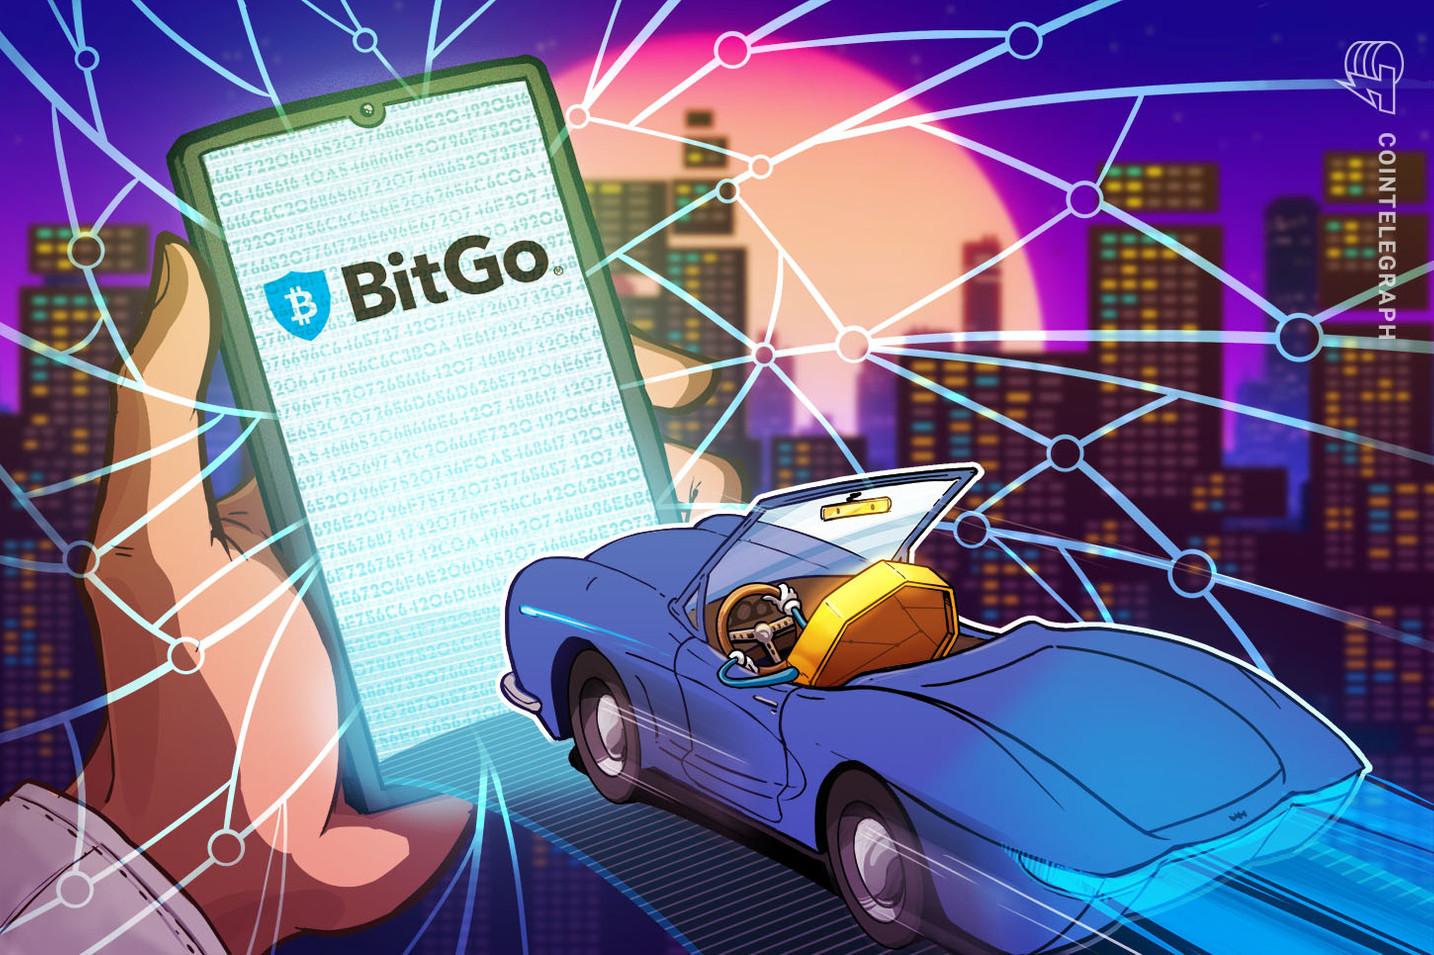 BitGo assets hit $16 billion as institutional adoption grows